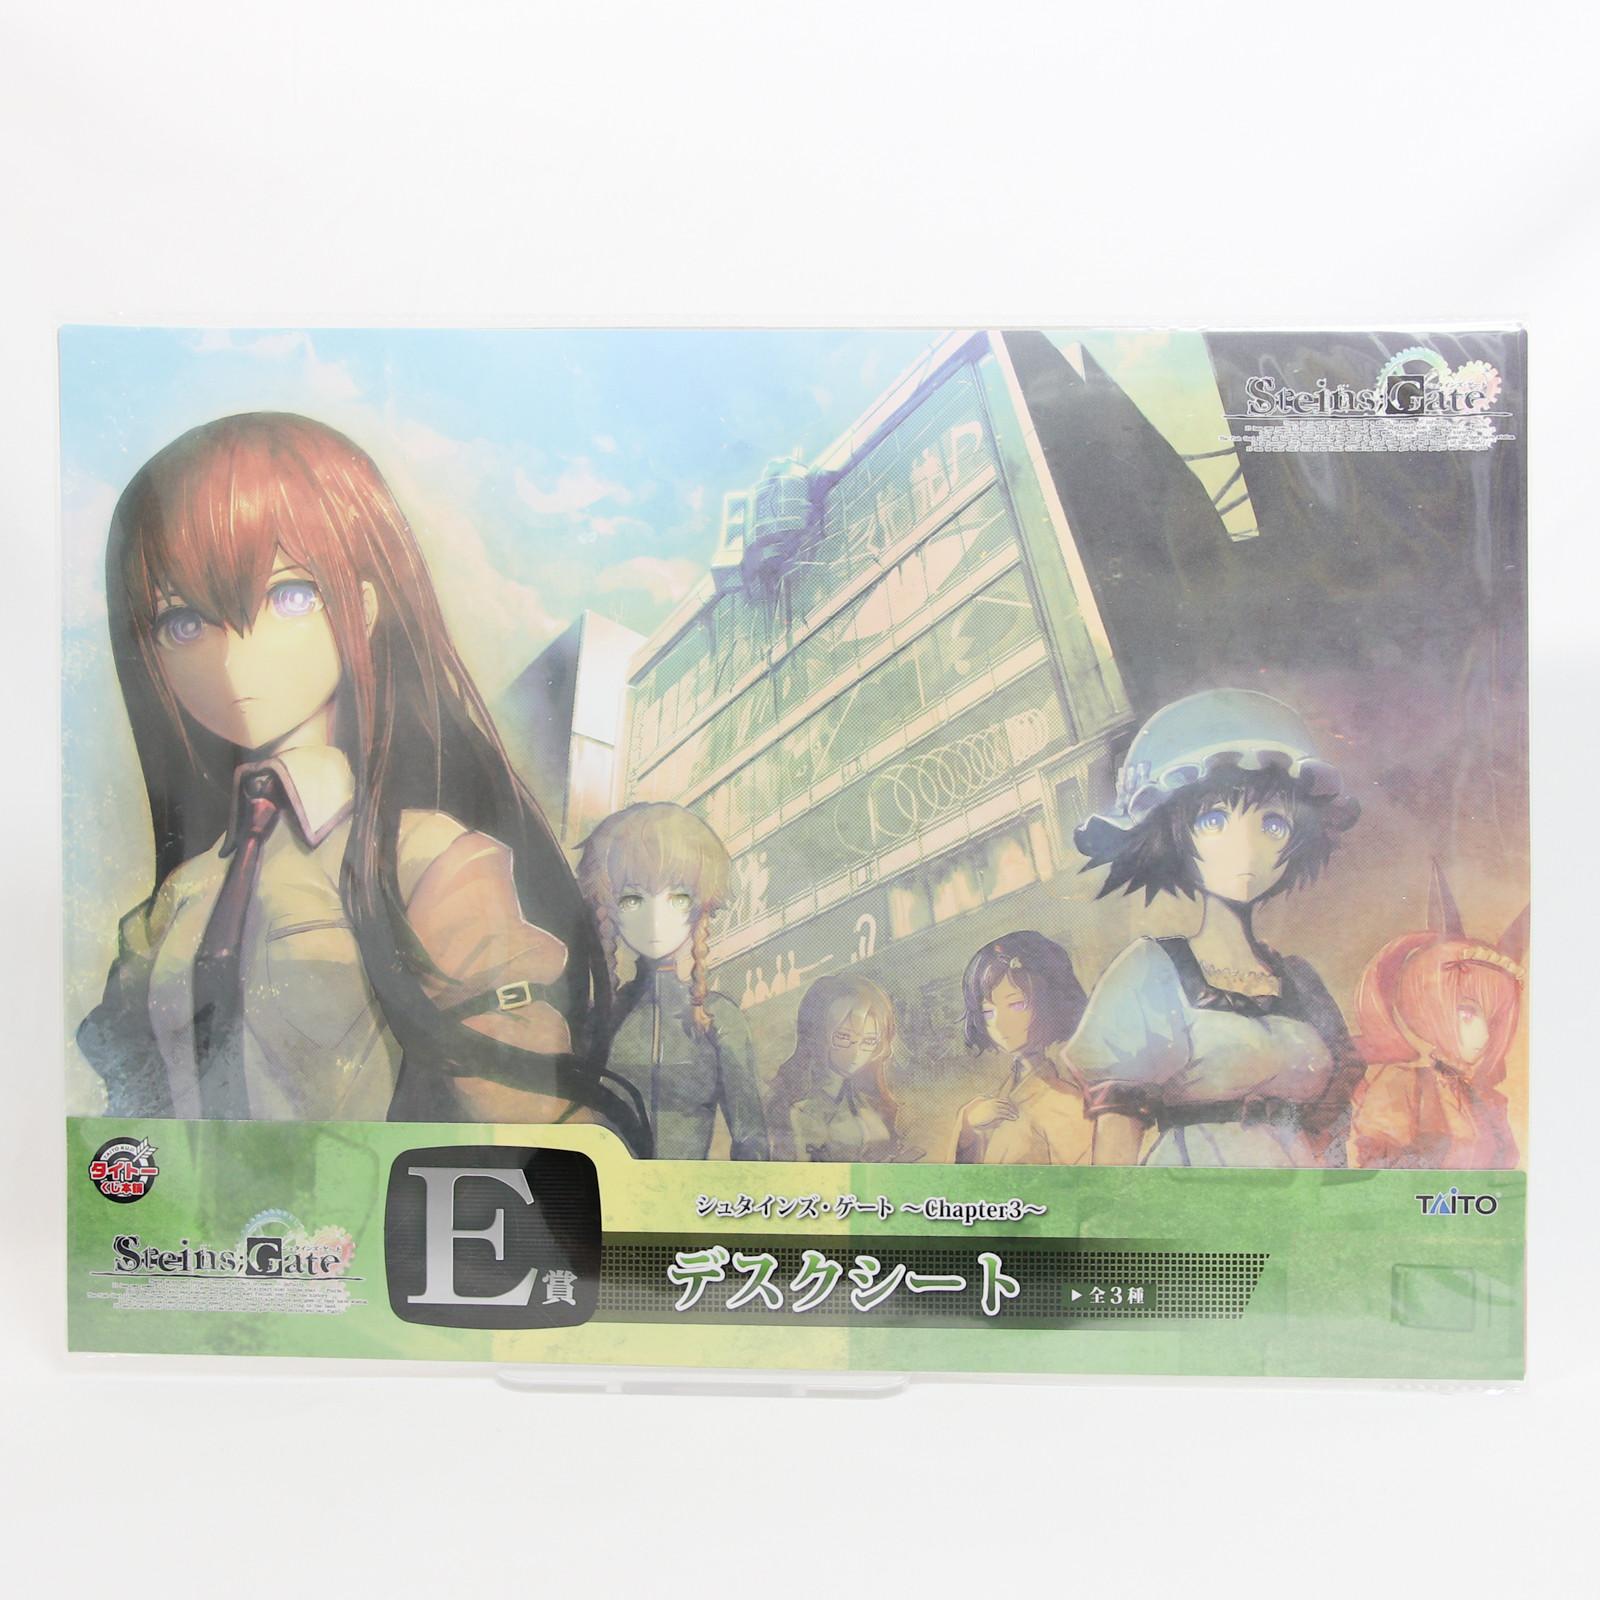 Steins ; Gate Kurisu Mayuri Ruka Moeka Faris Picture Sheet Taito JAPAN ANIME